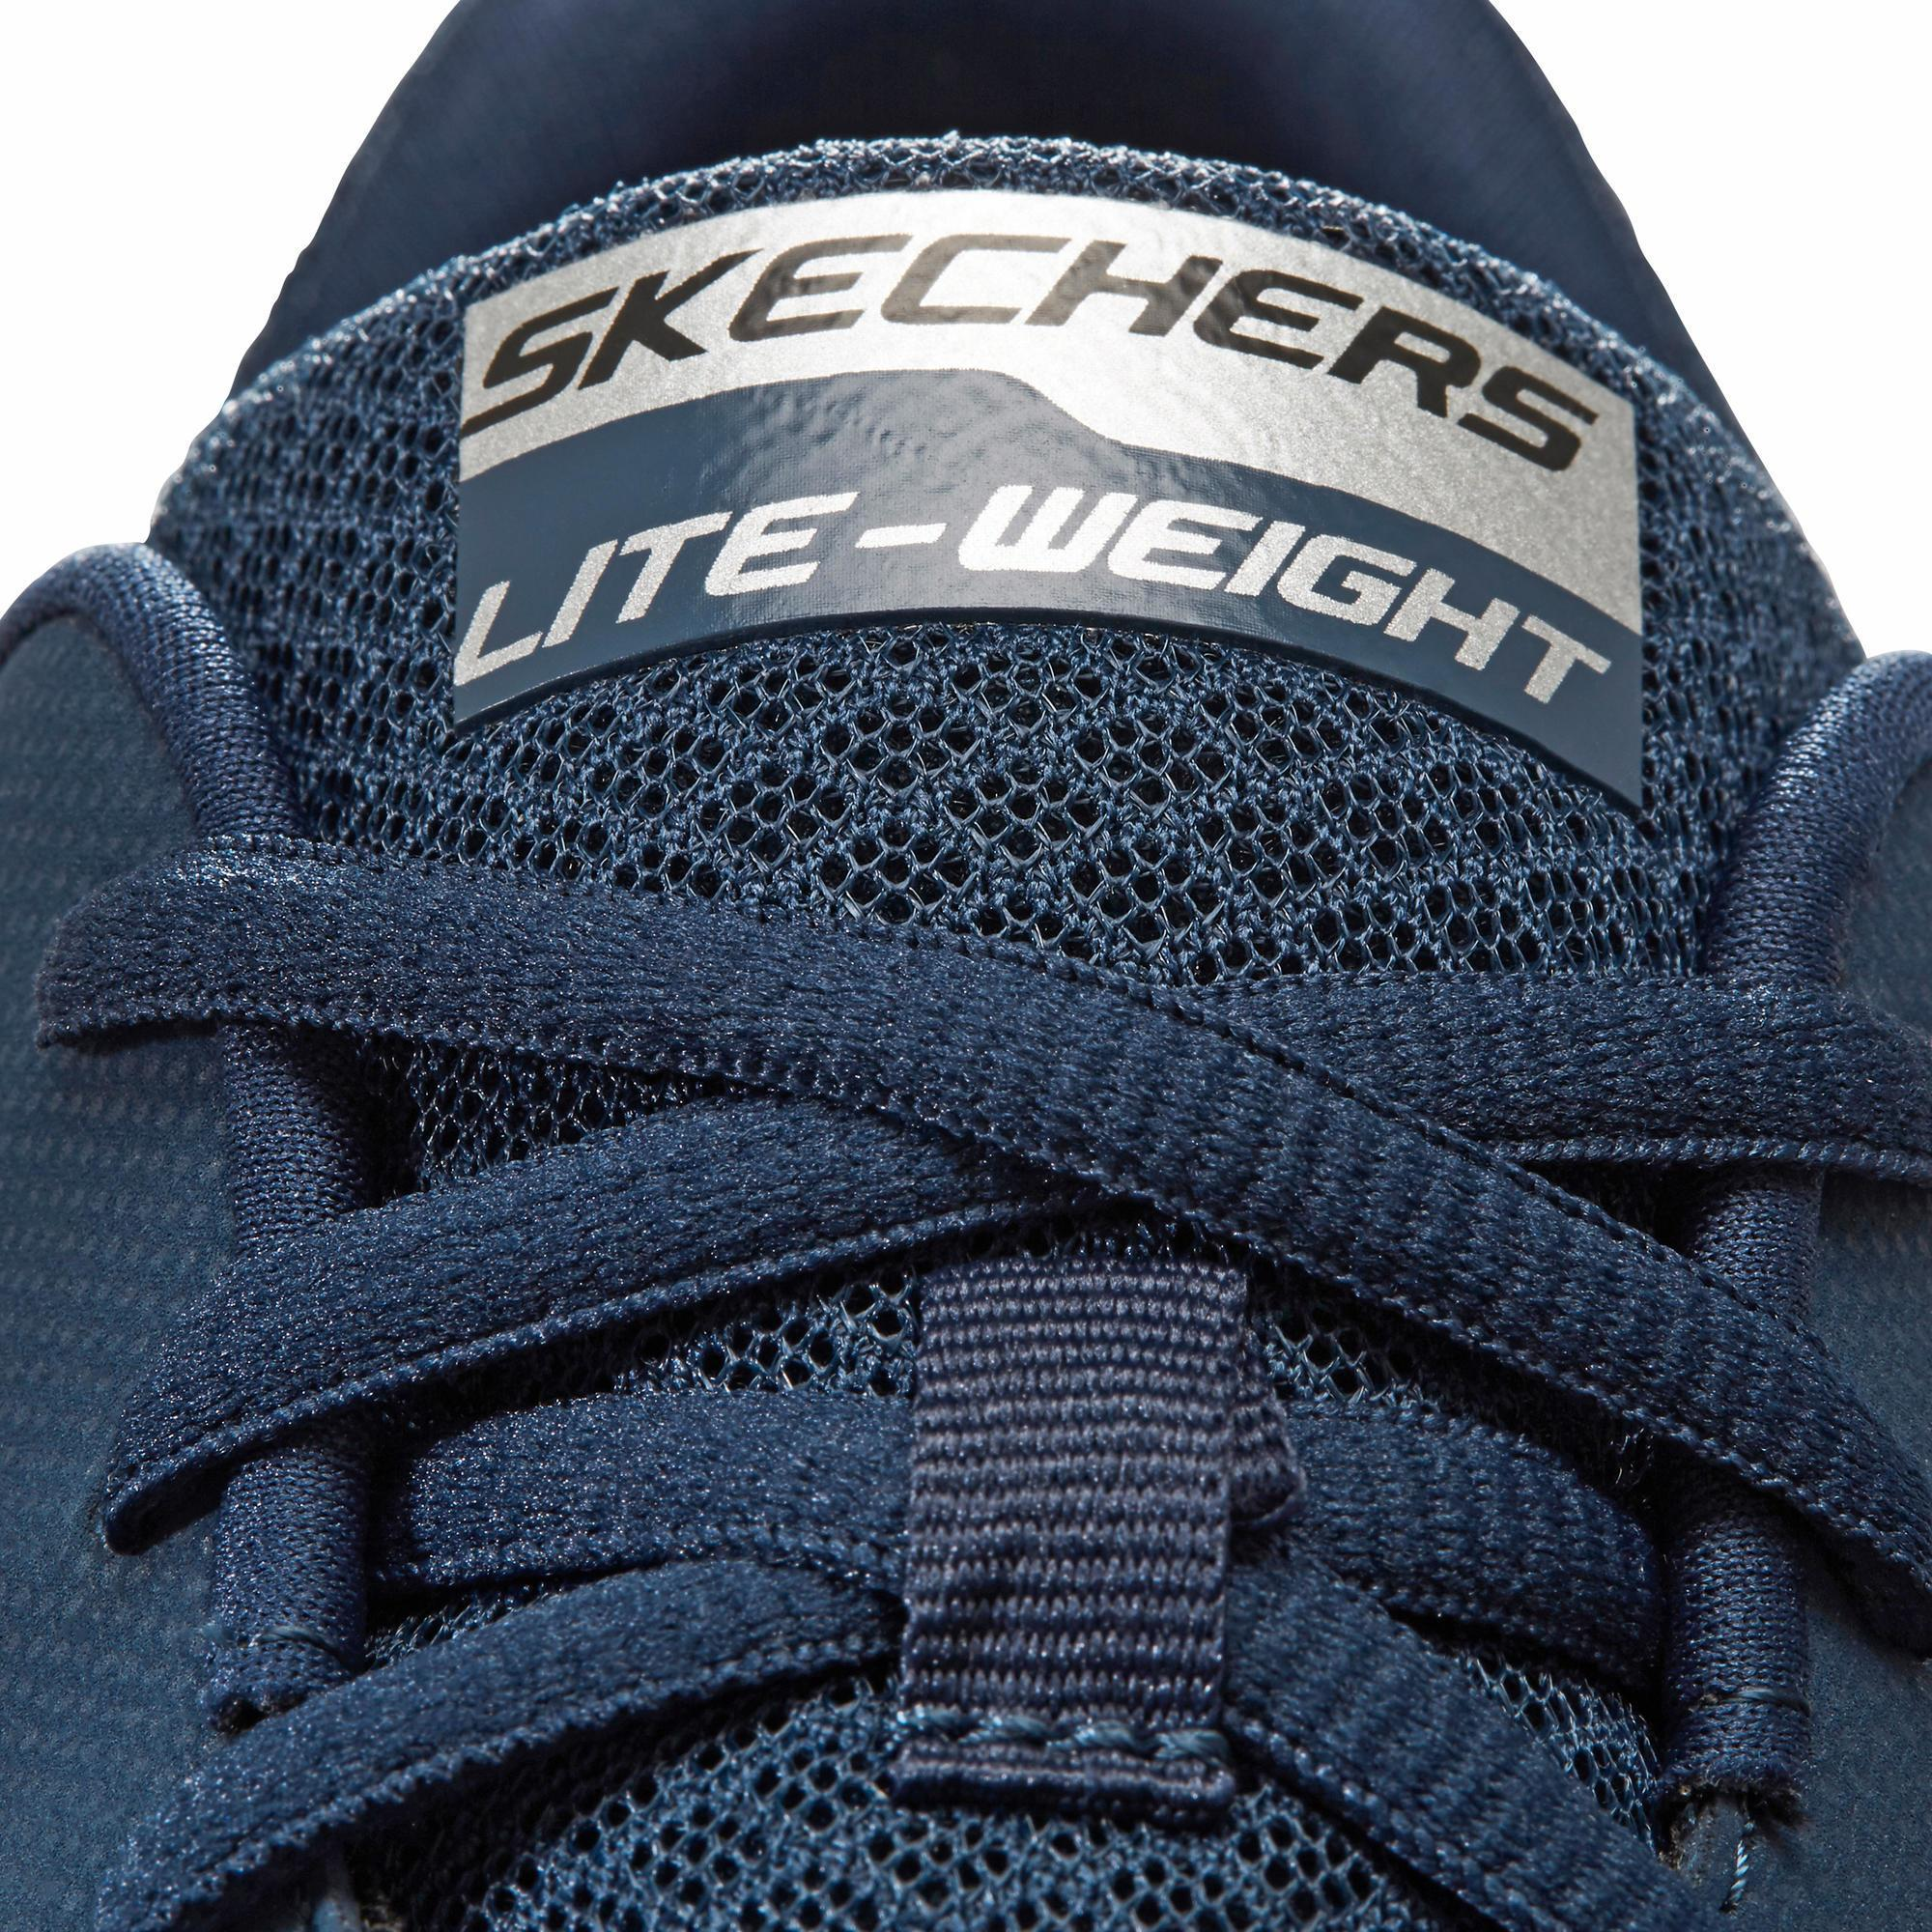 Dual Lite men's fitness walking shoes